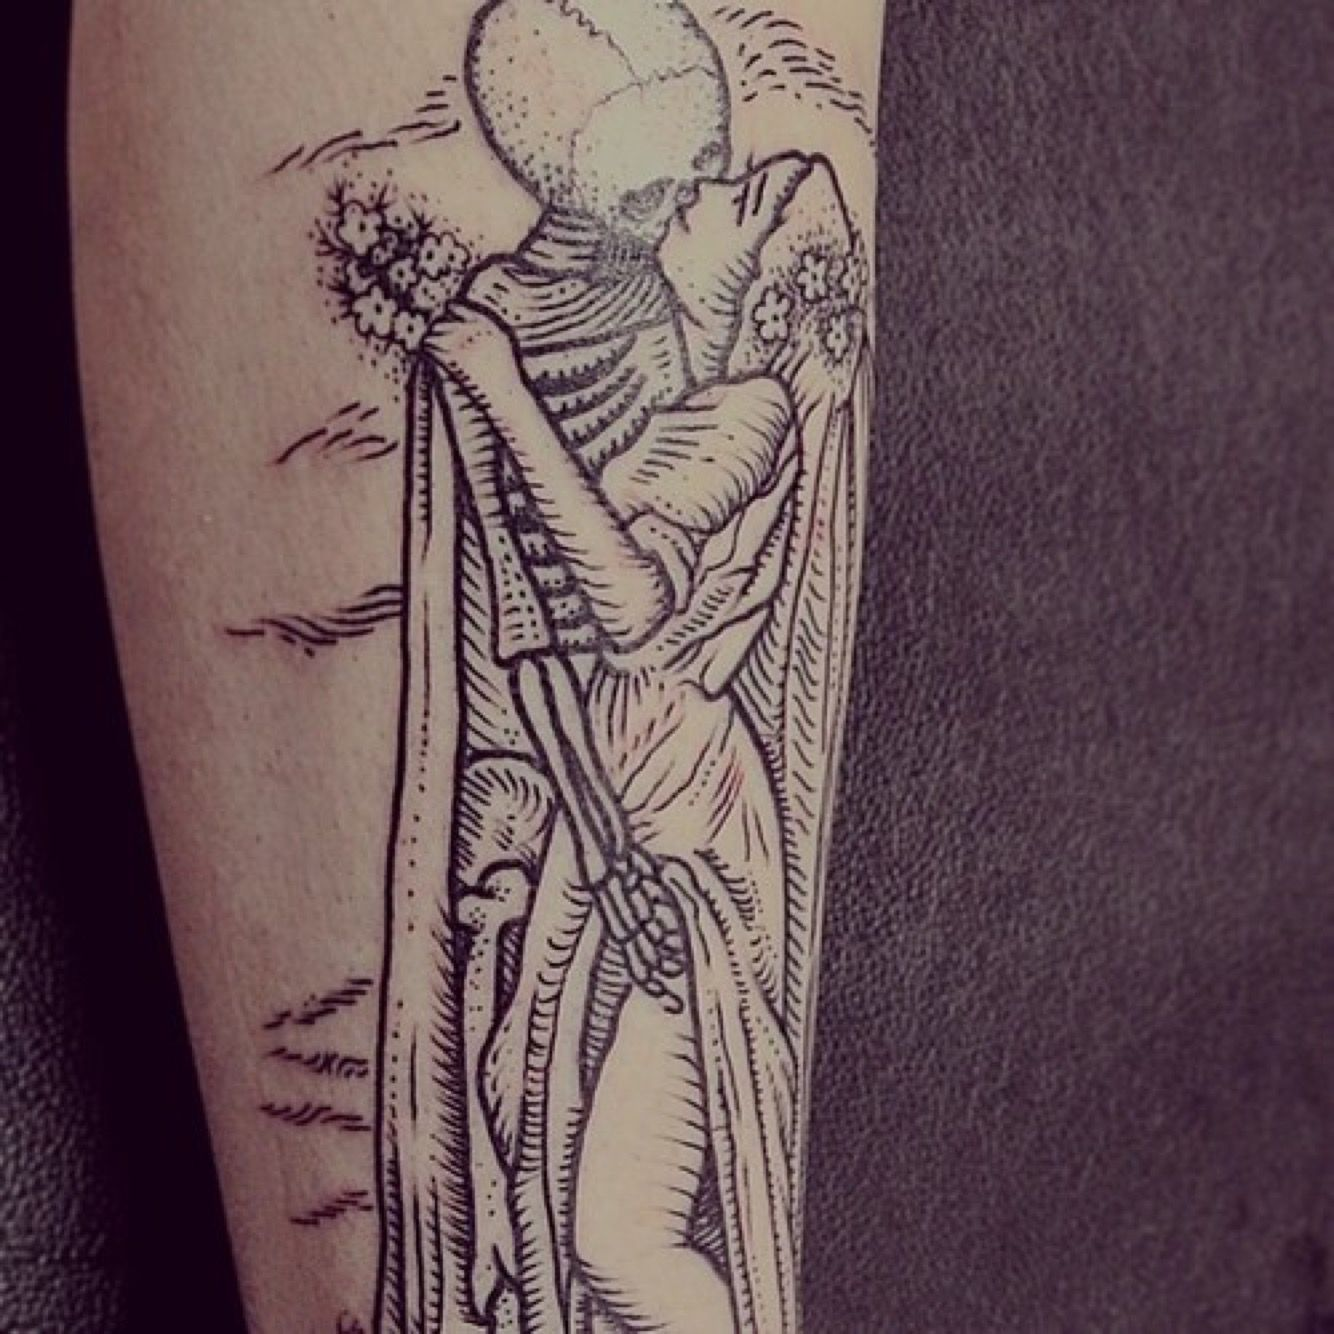 Pin by Tanner LaRae on Tats Memento mori tattoo, Tattoos